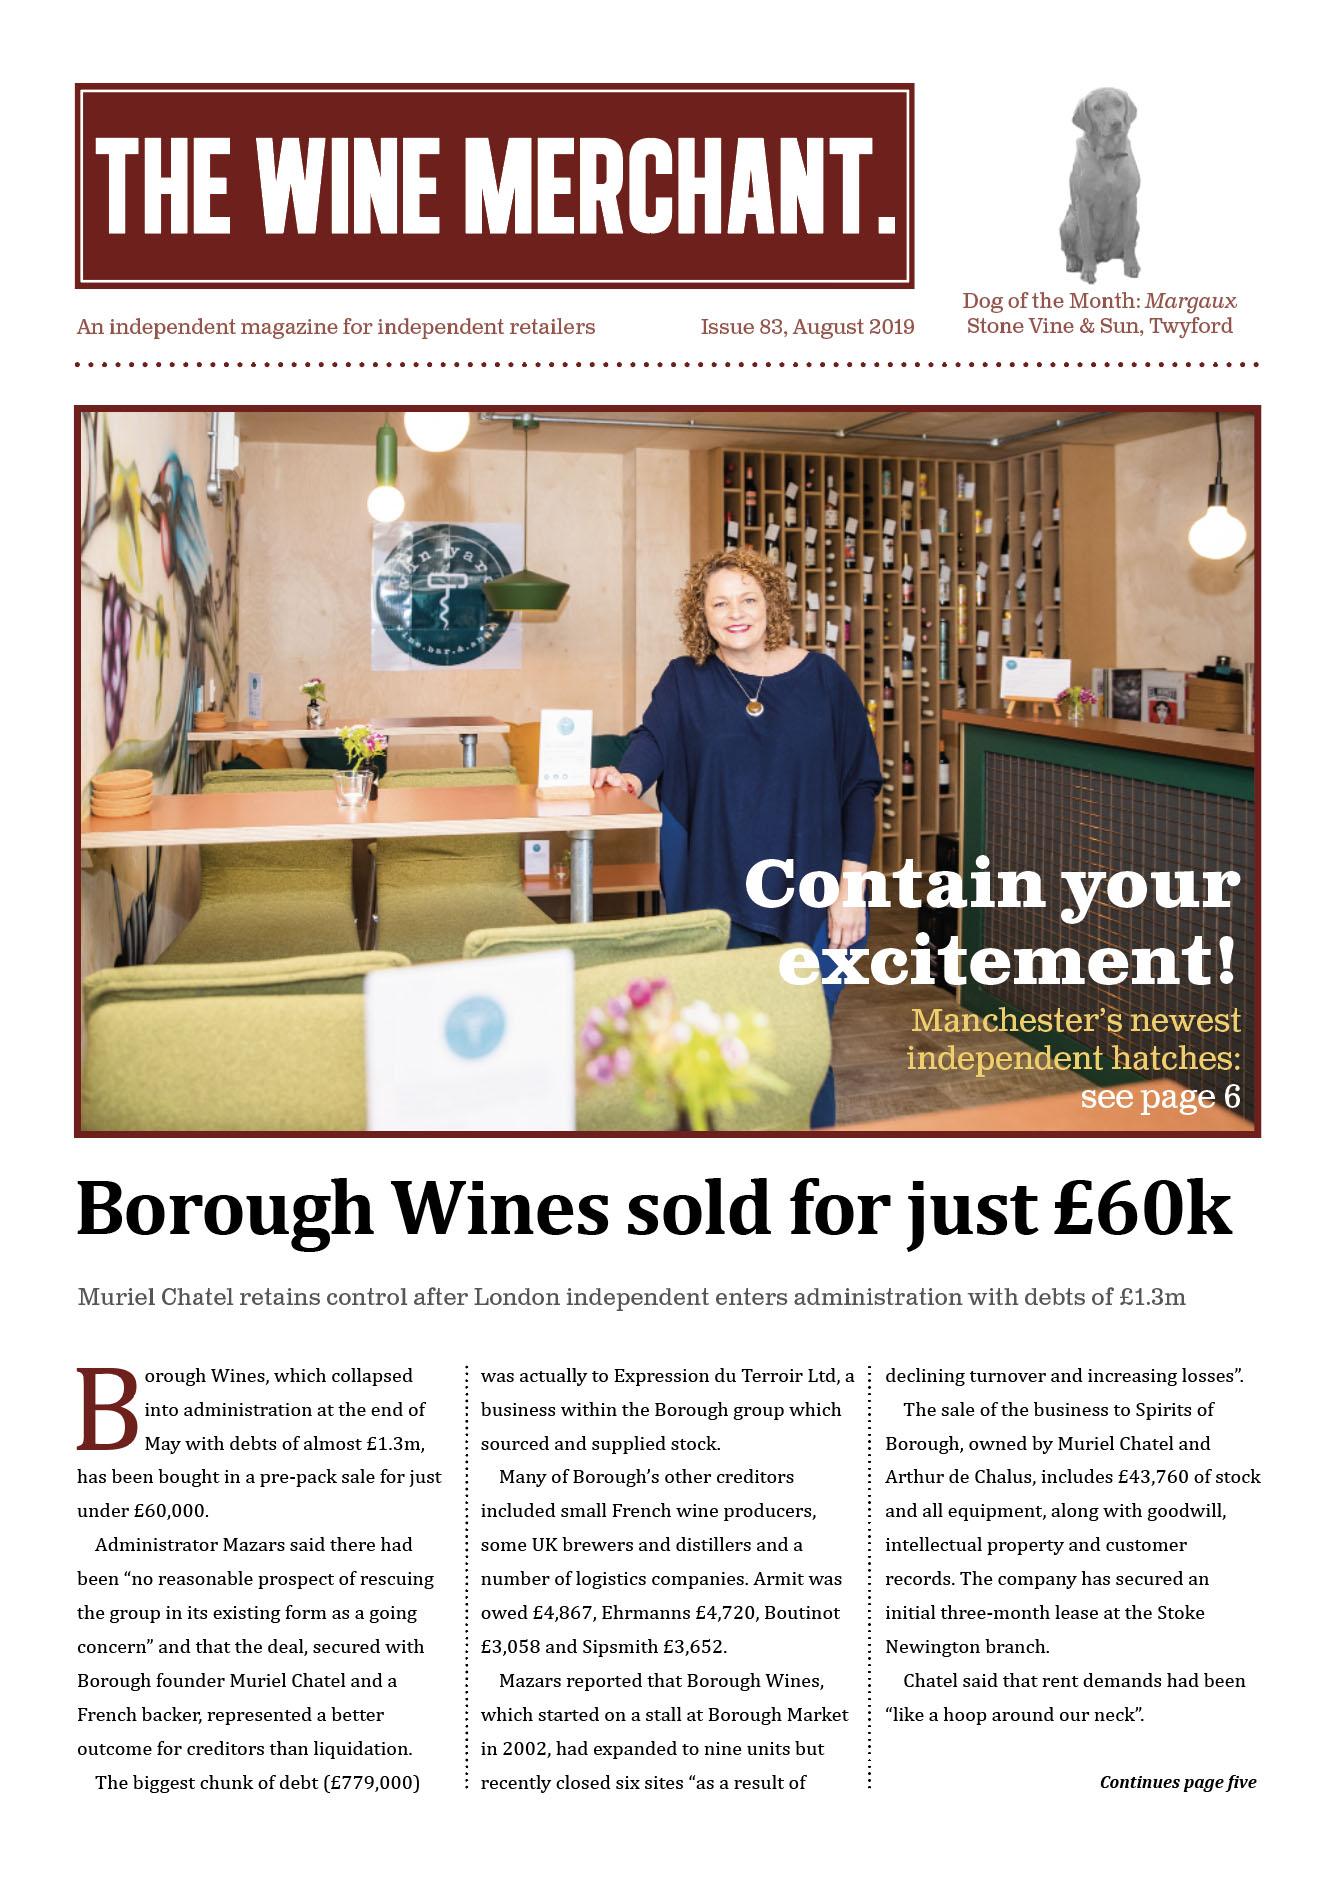 The Wine Merchant August 2019